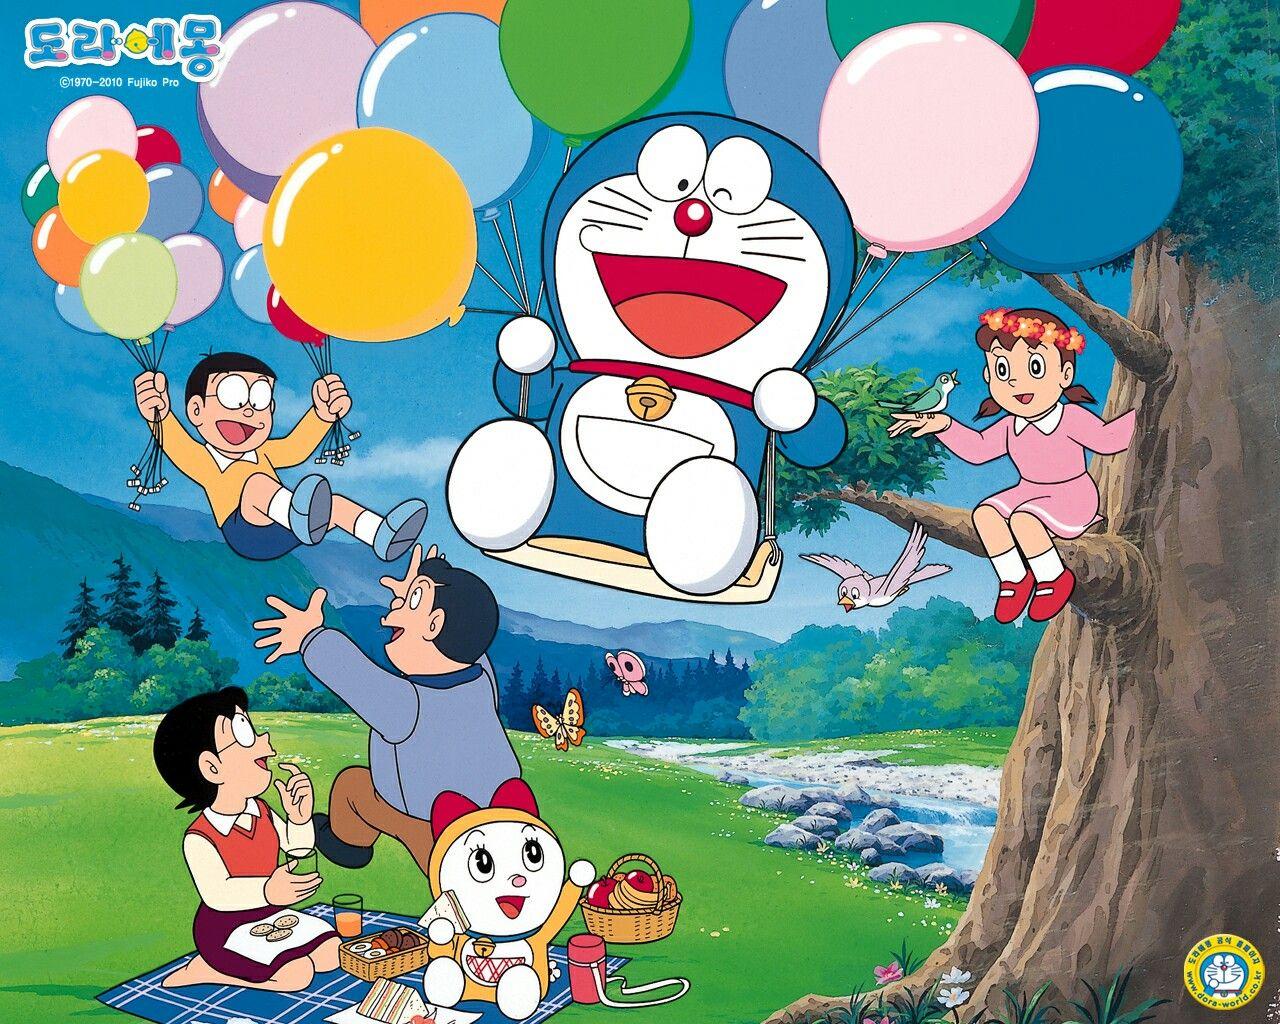 Pin by ukhty tikha on dor'em Doraemon wallpapers